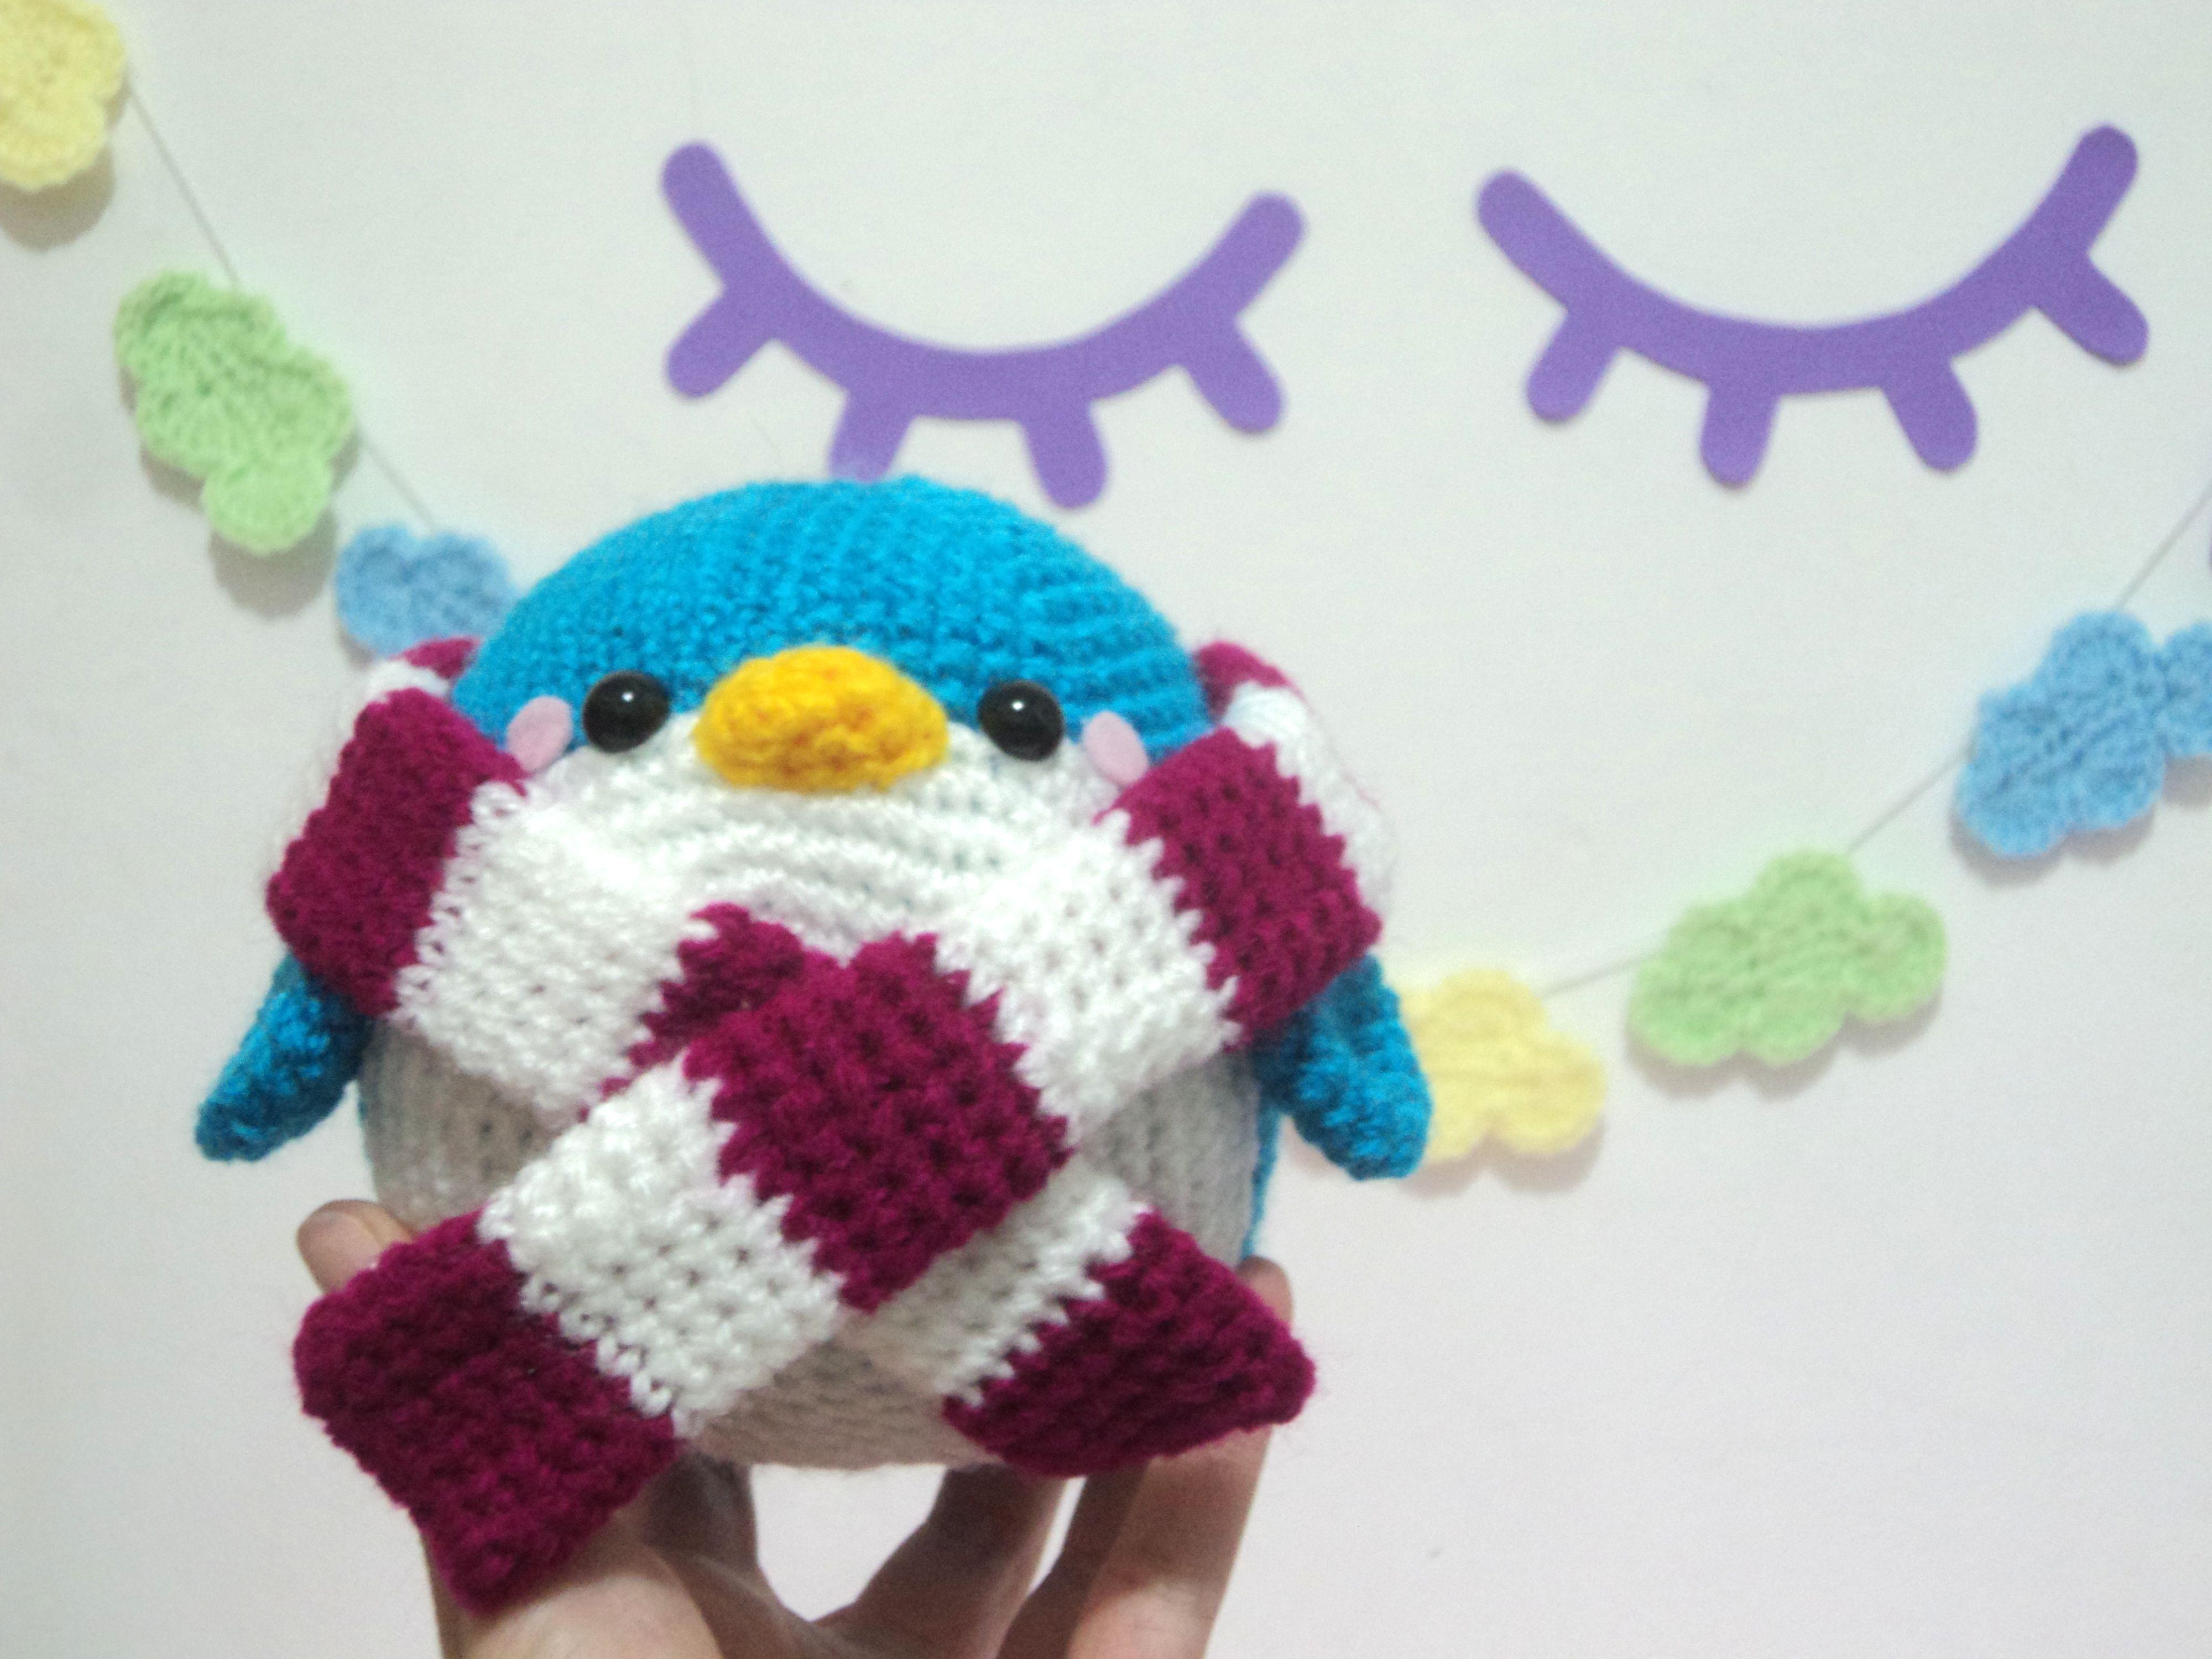 Horgolt Amigurumi Nyuszi : Pinguim bolinha de crochê amigurumi